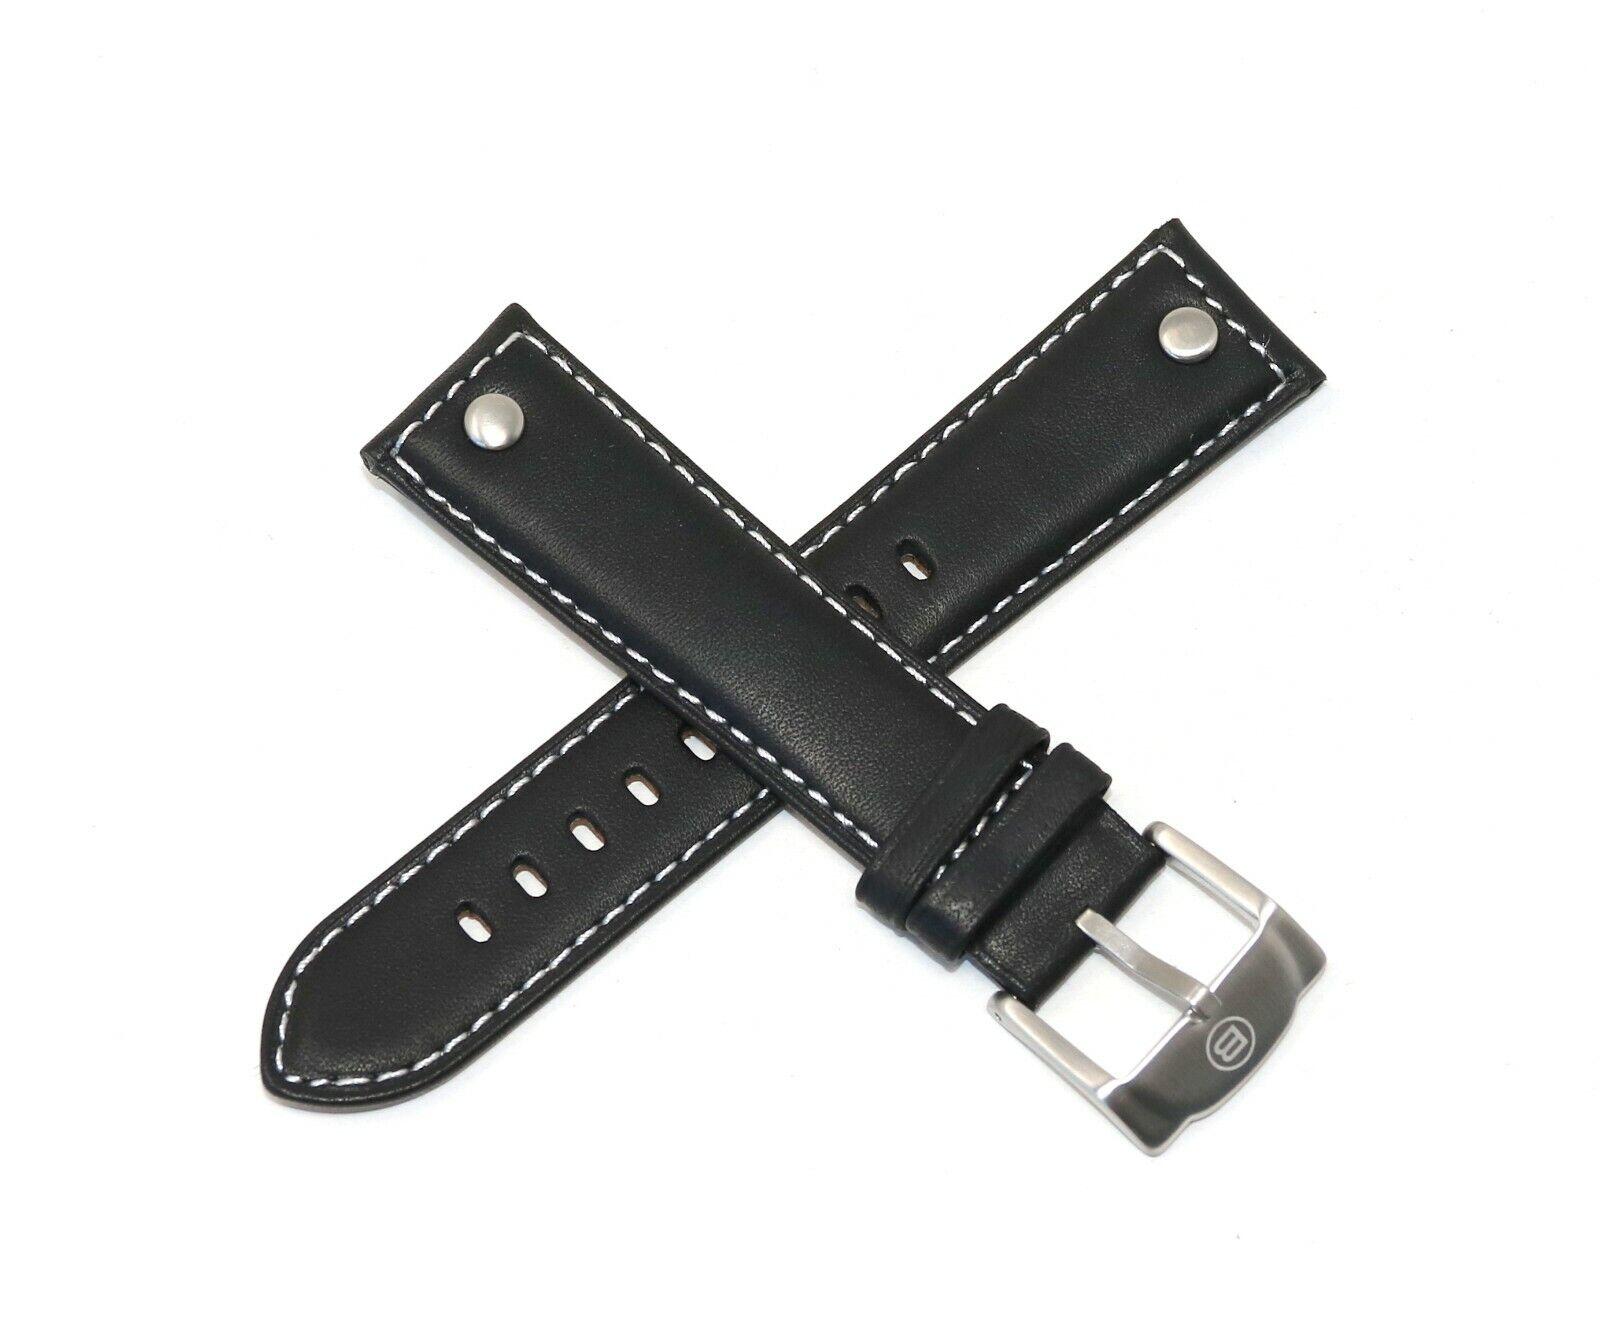 Ben & Sons Lederarmband 22 MM Echtleder Schwarz mit silberner Schließe